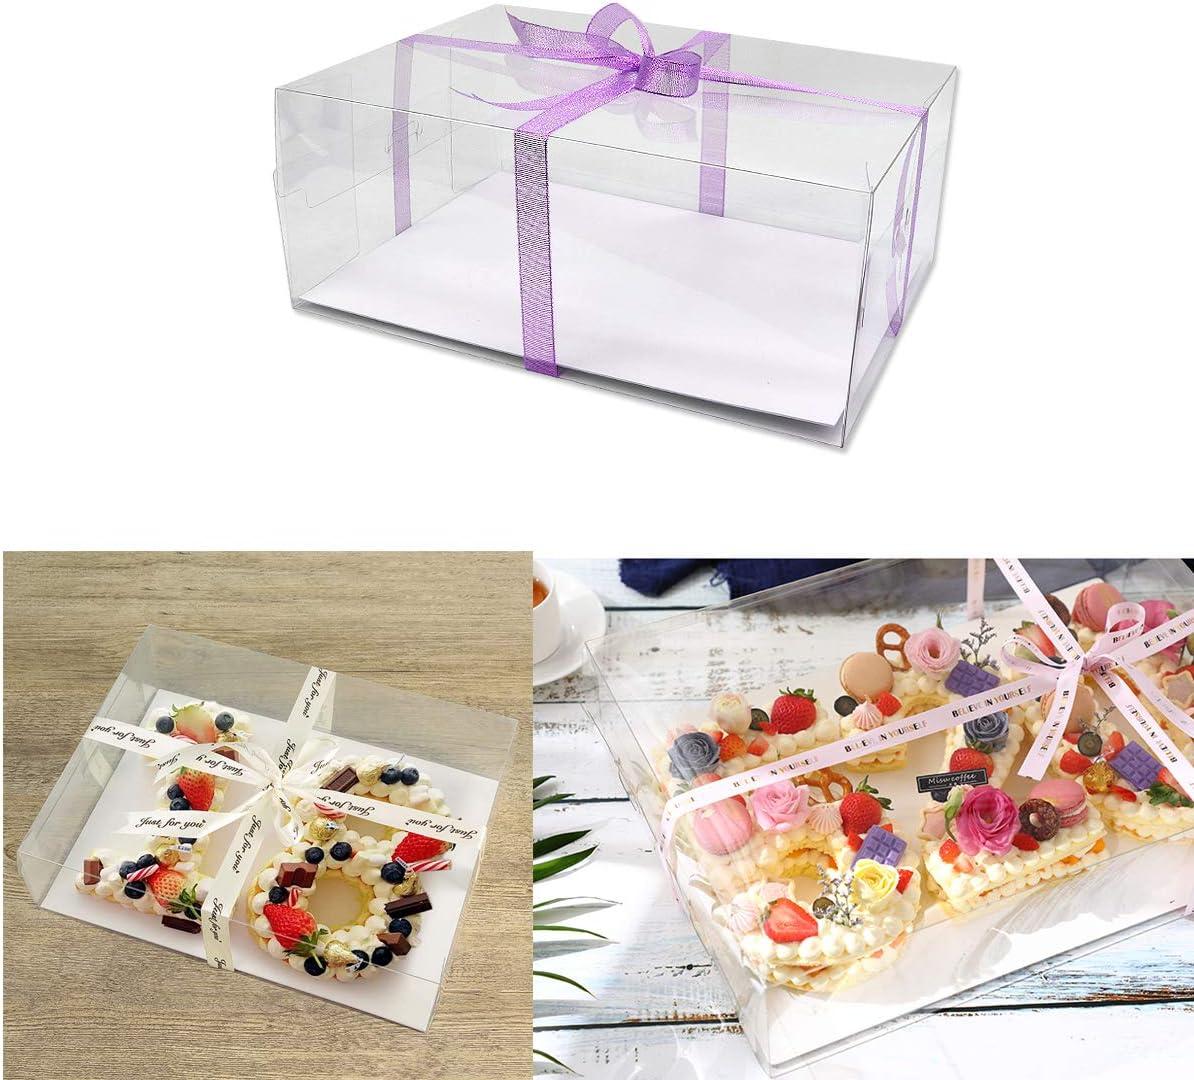 Poitemsis - Caja de plástico transparente para tarta de cumpleaños ...